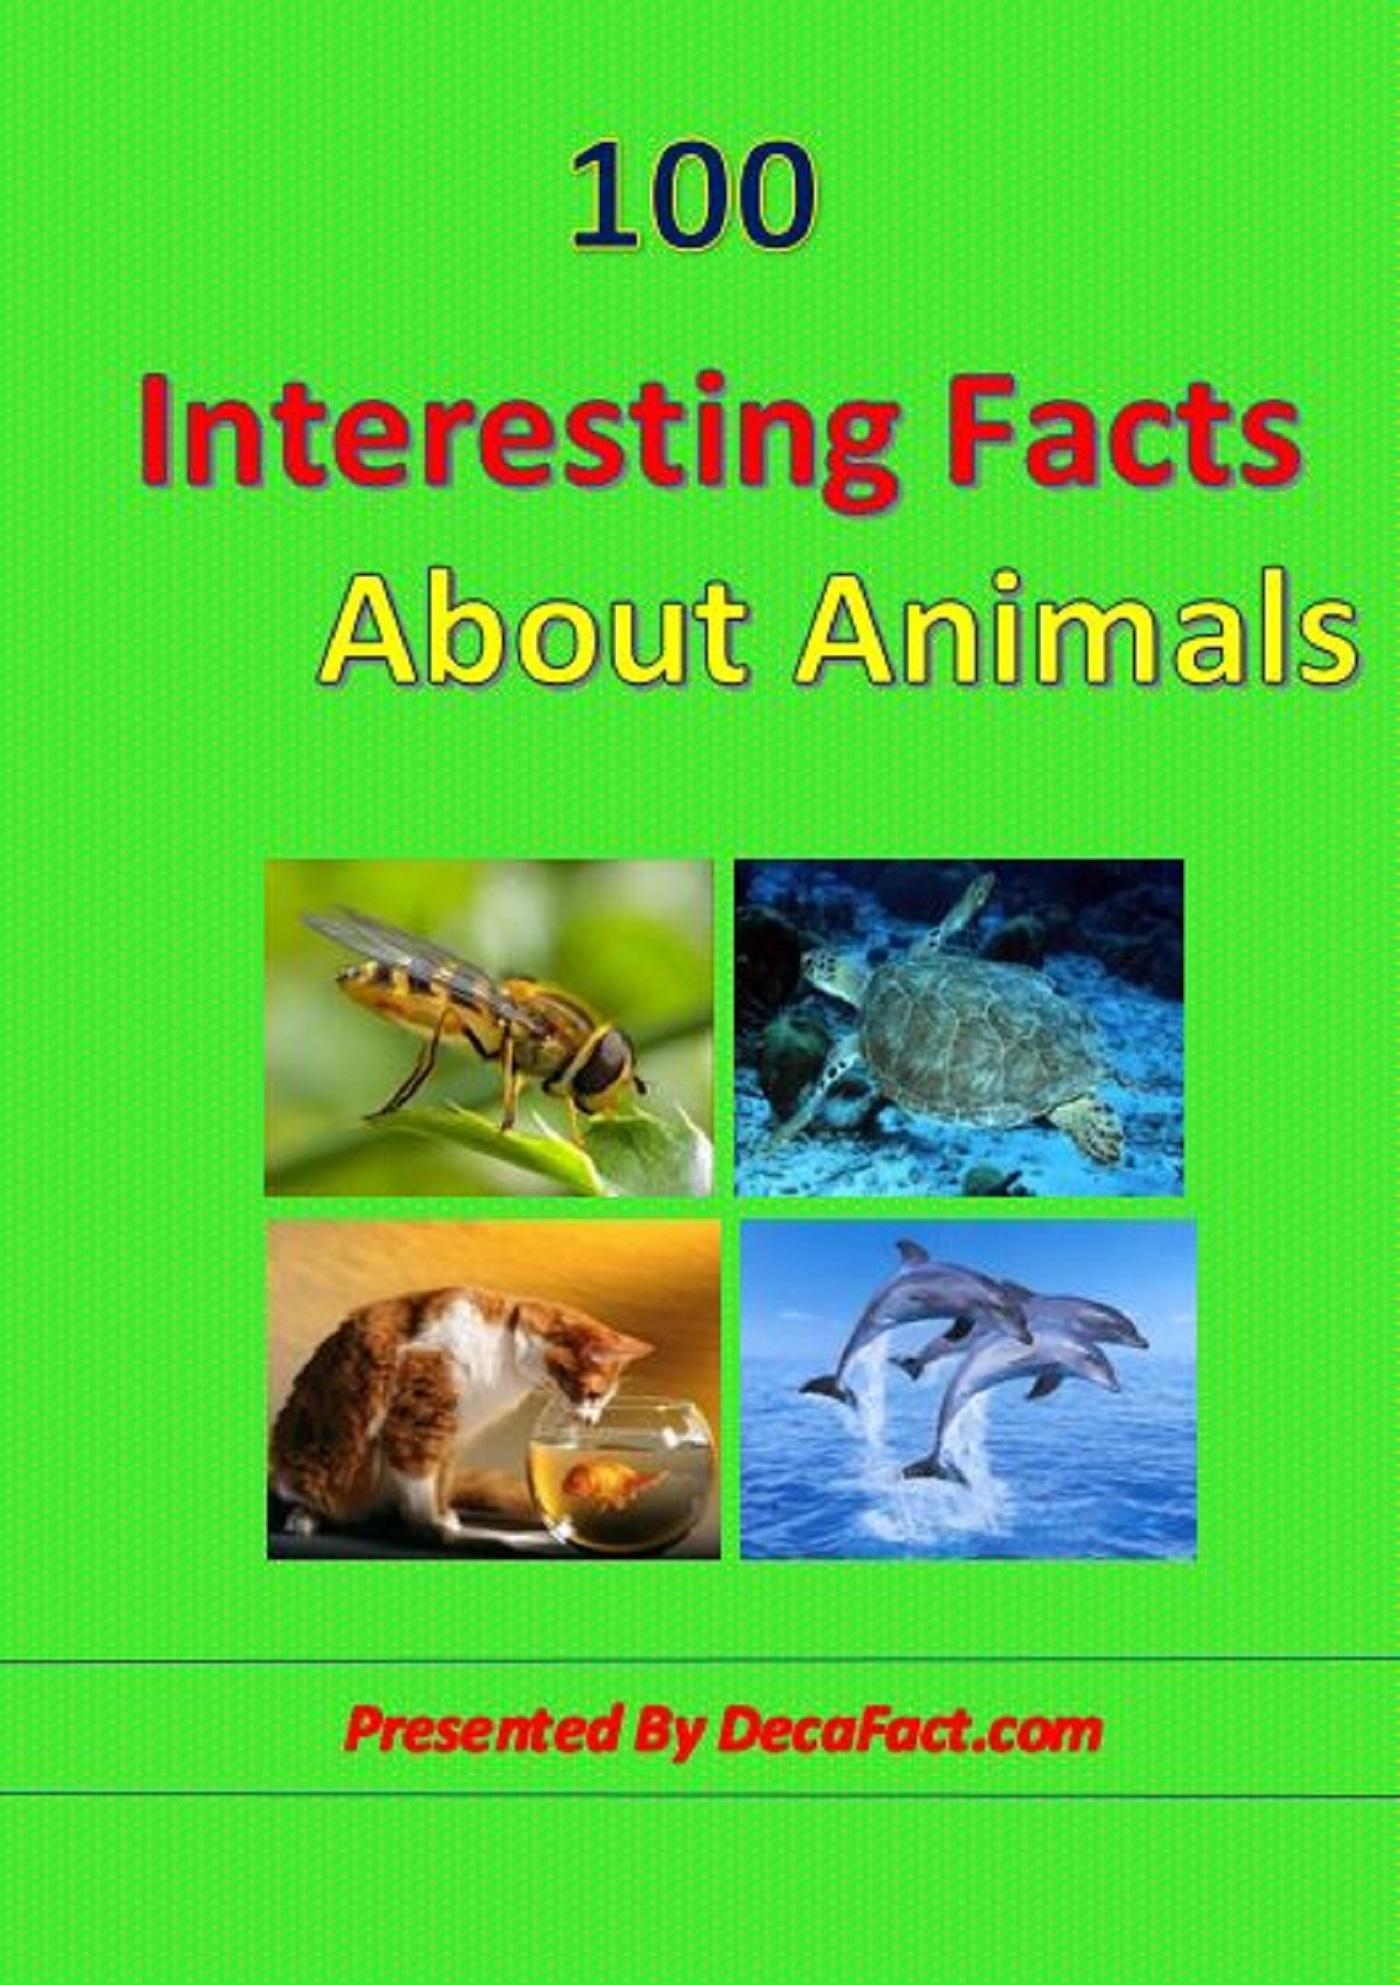 100 Interesting Animal Facts